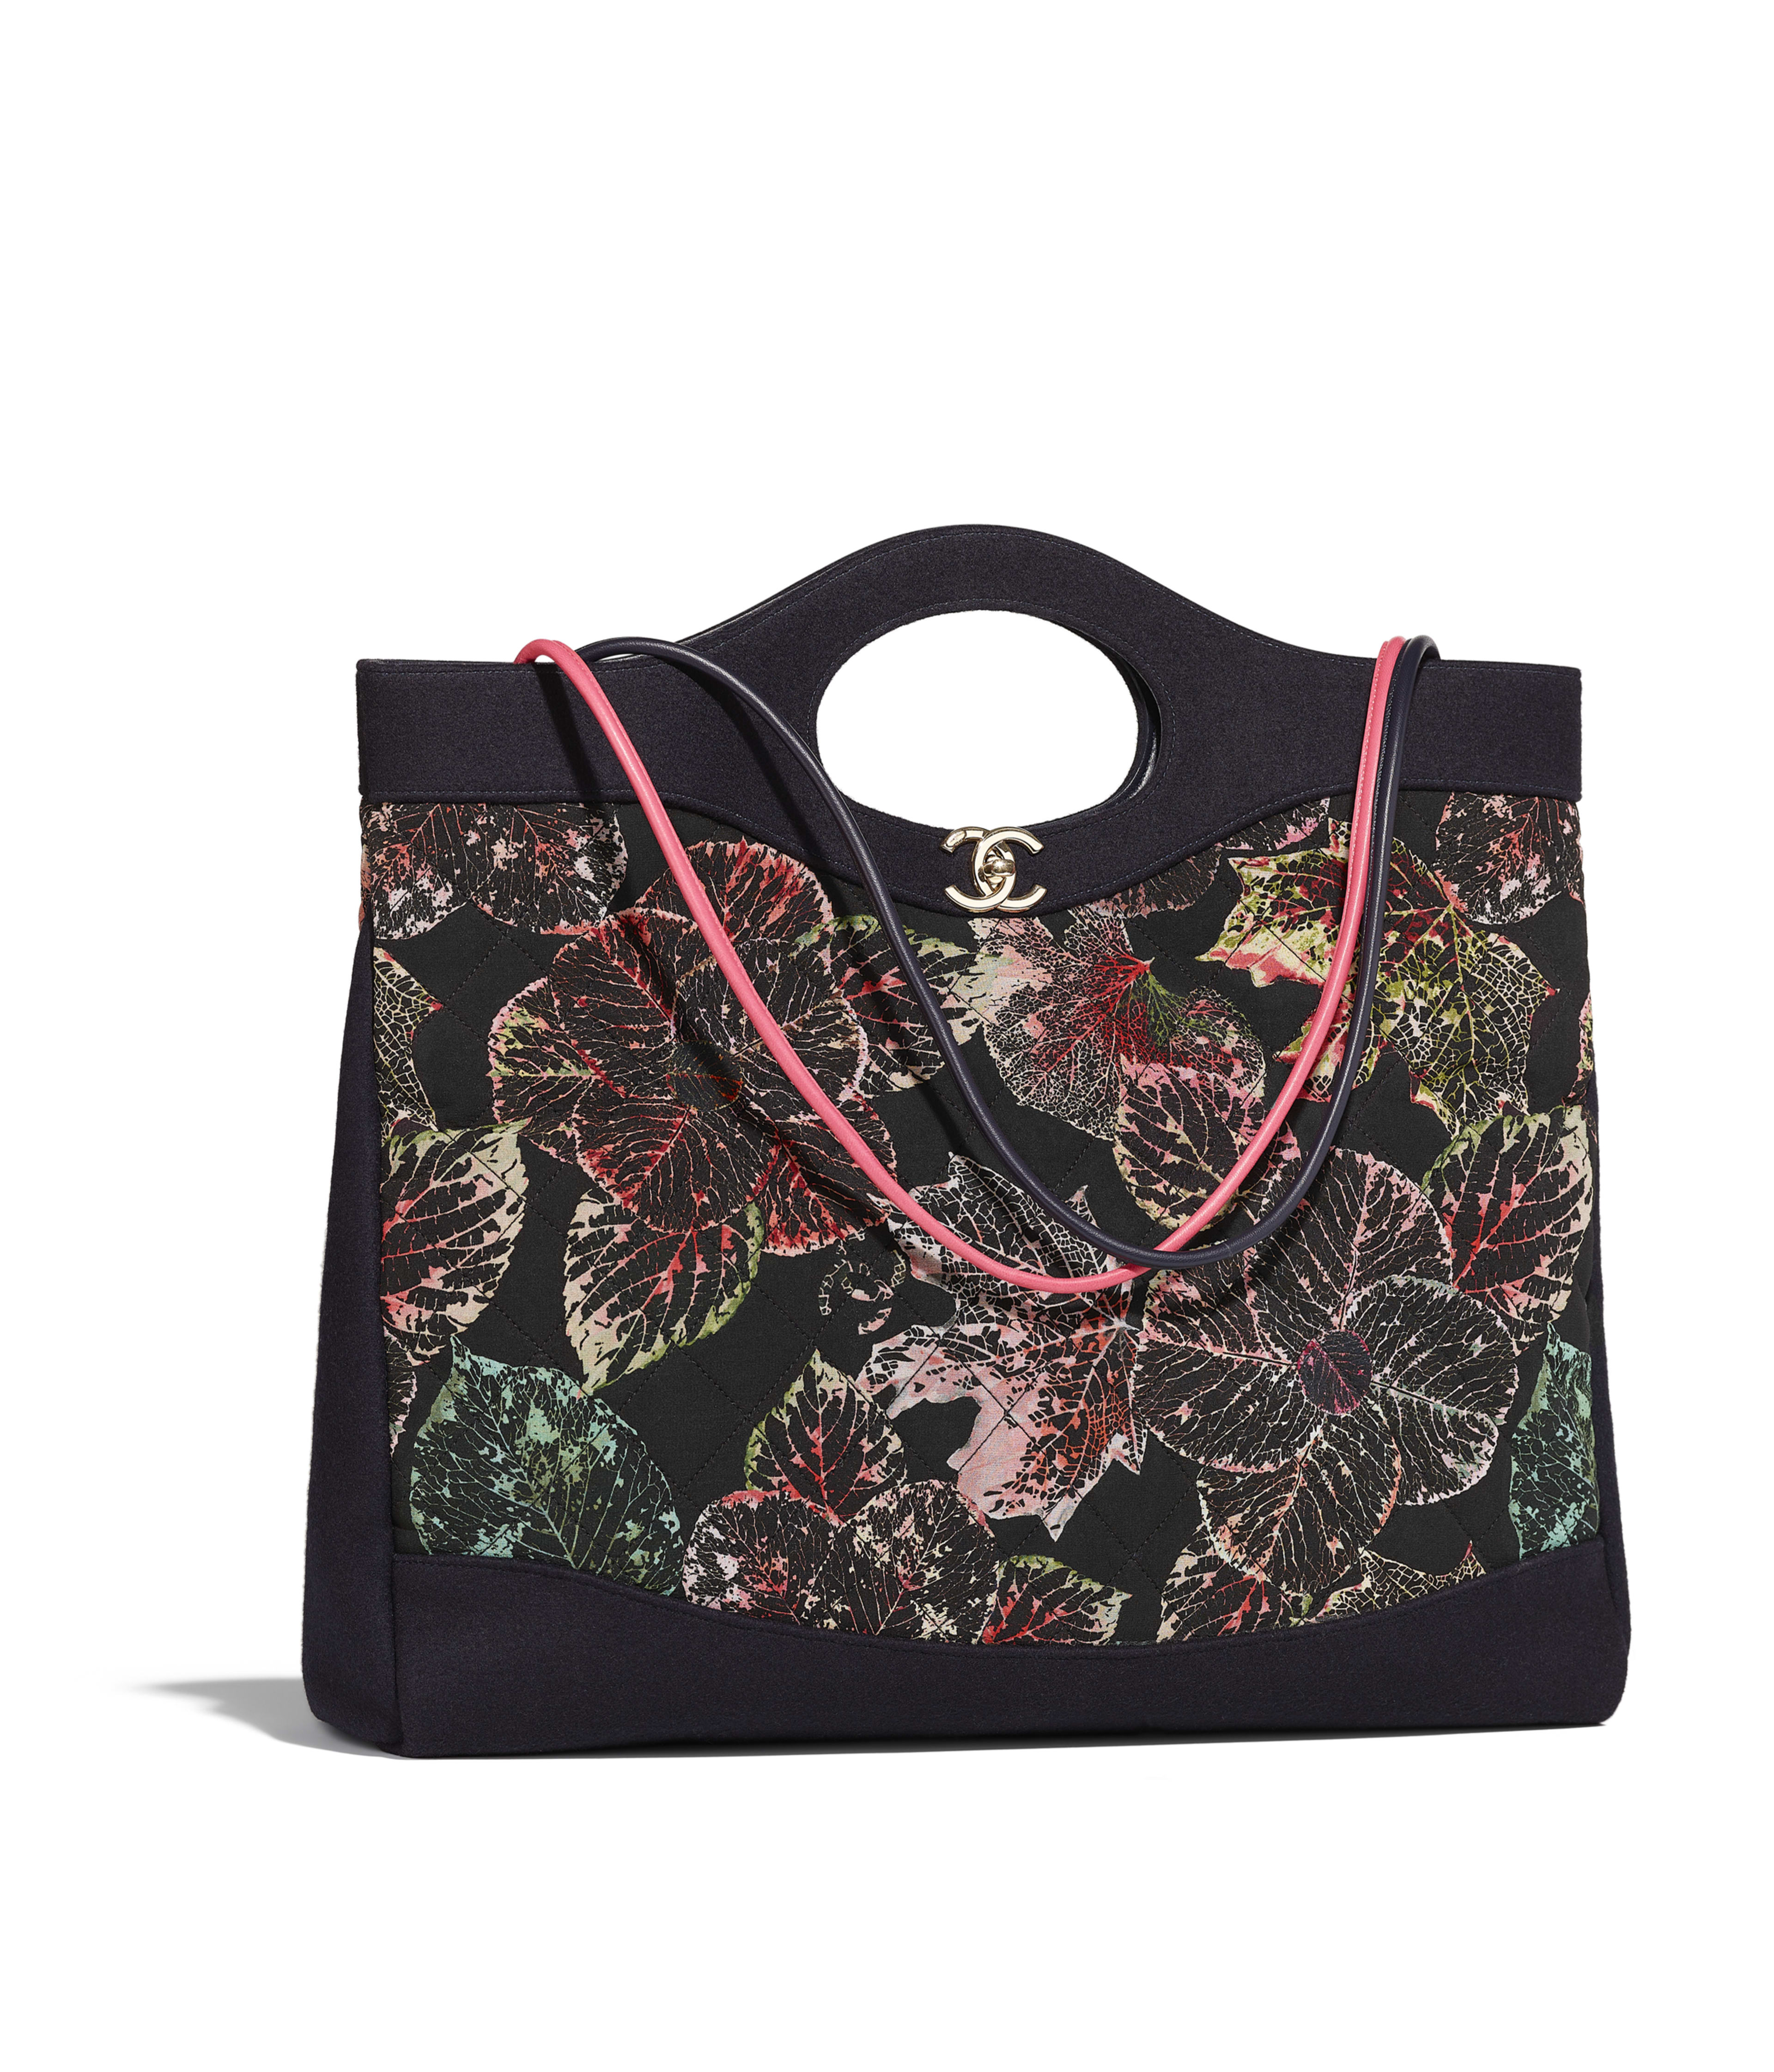 Chanel 31 Large Ping Bag Calfskin Silk Cotton Wool Gold Tone Metal Black Ecru Red Green Ref A57978y84007k1219